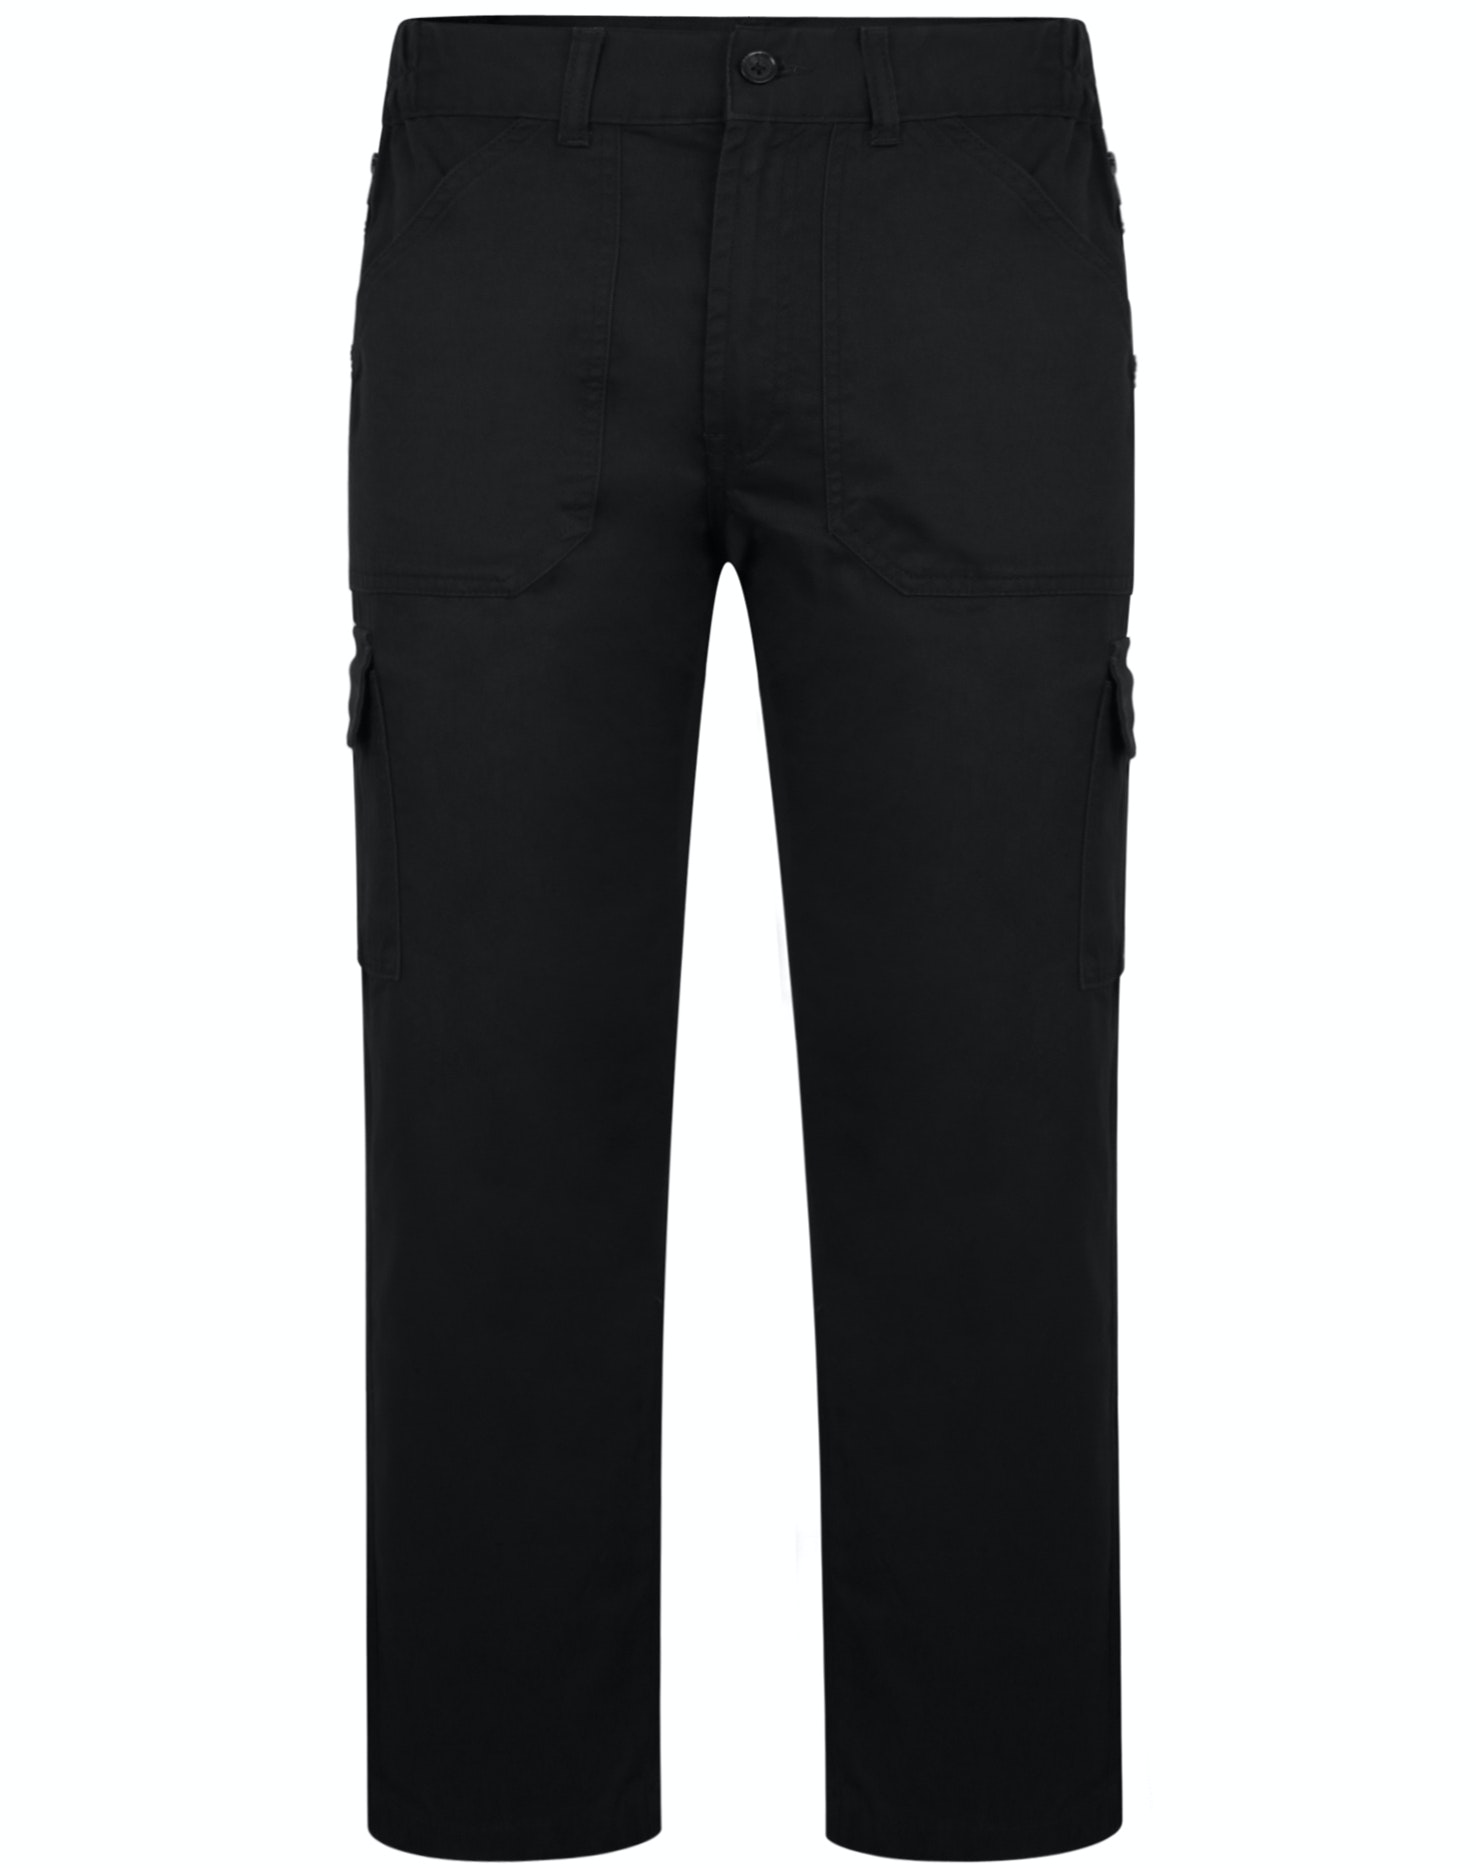 Mens Kingsize Trousers Big Sizes 44 46 48 50 52 54 56 58 60 62 inch waist